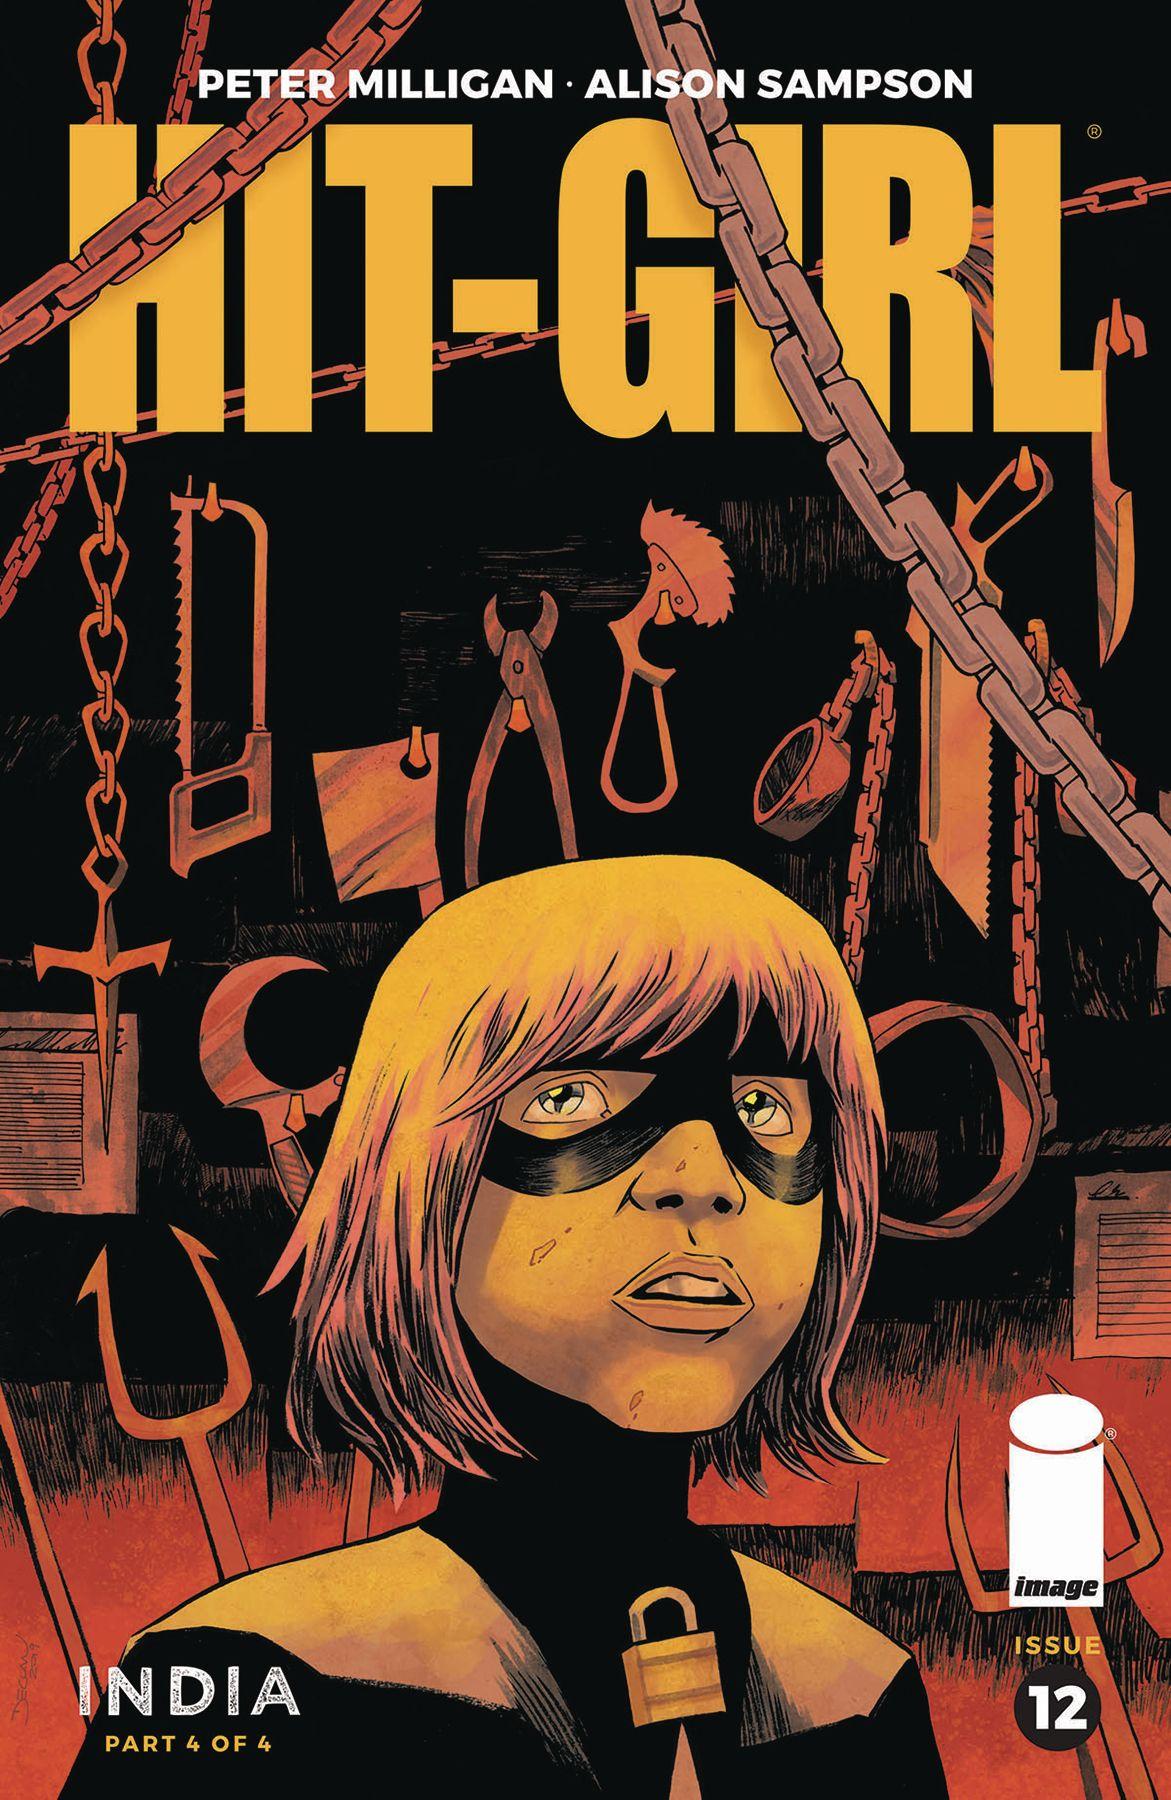 Hitgirl season two vol 1 january 2020 issue 12